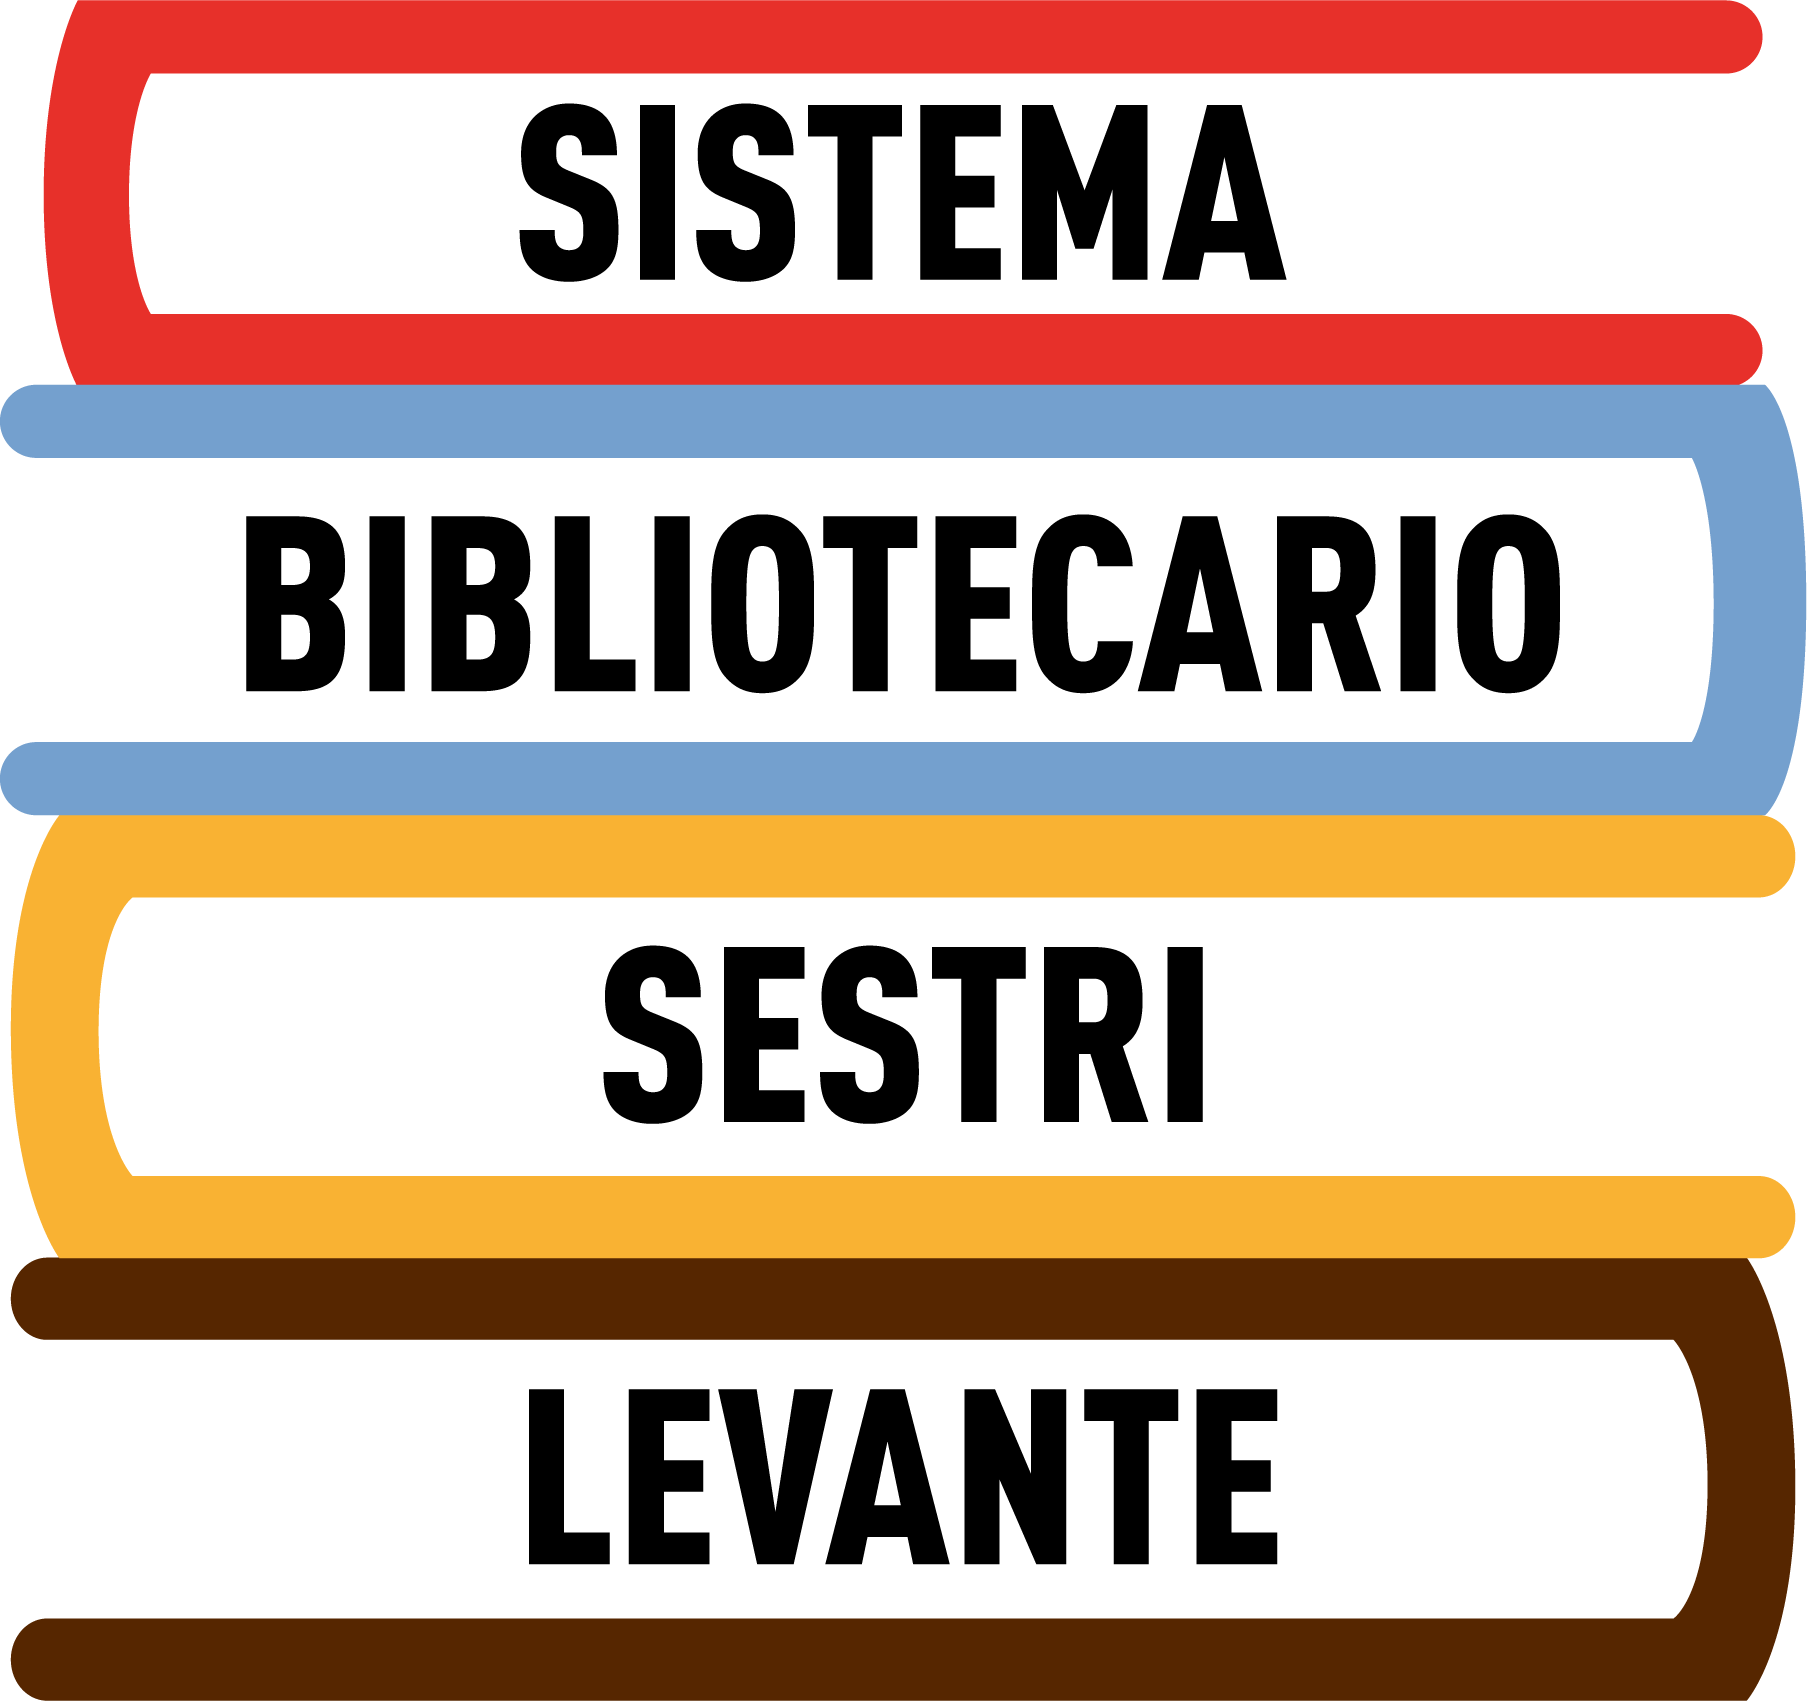 Sistema Bibliotecario Sestri Levante